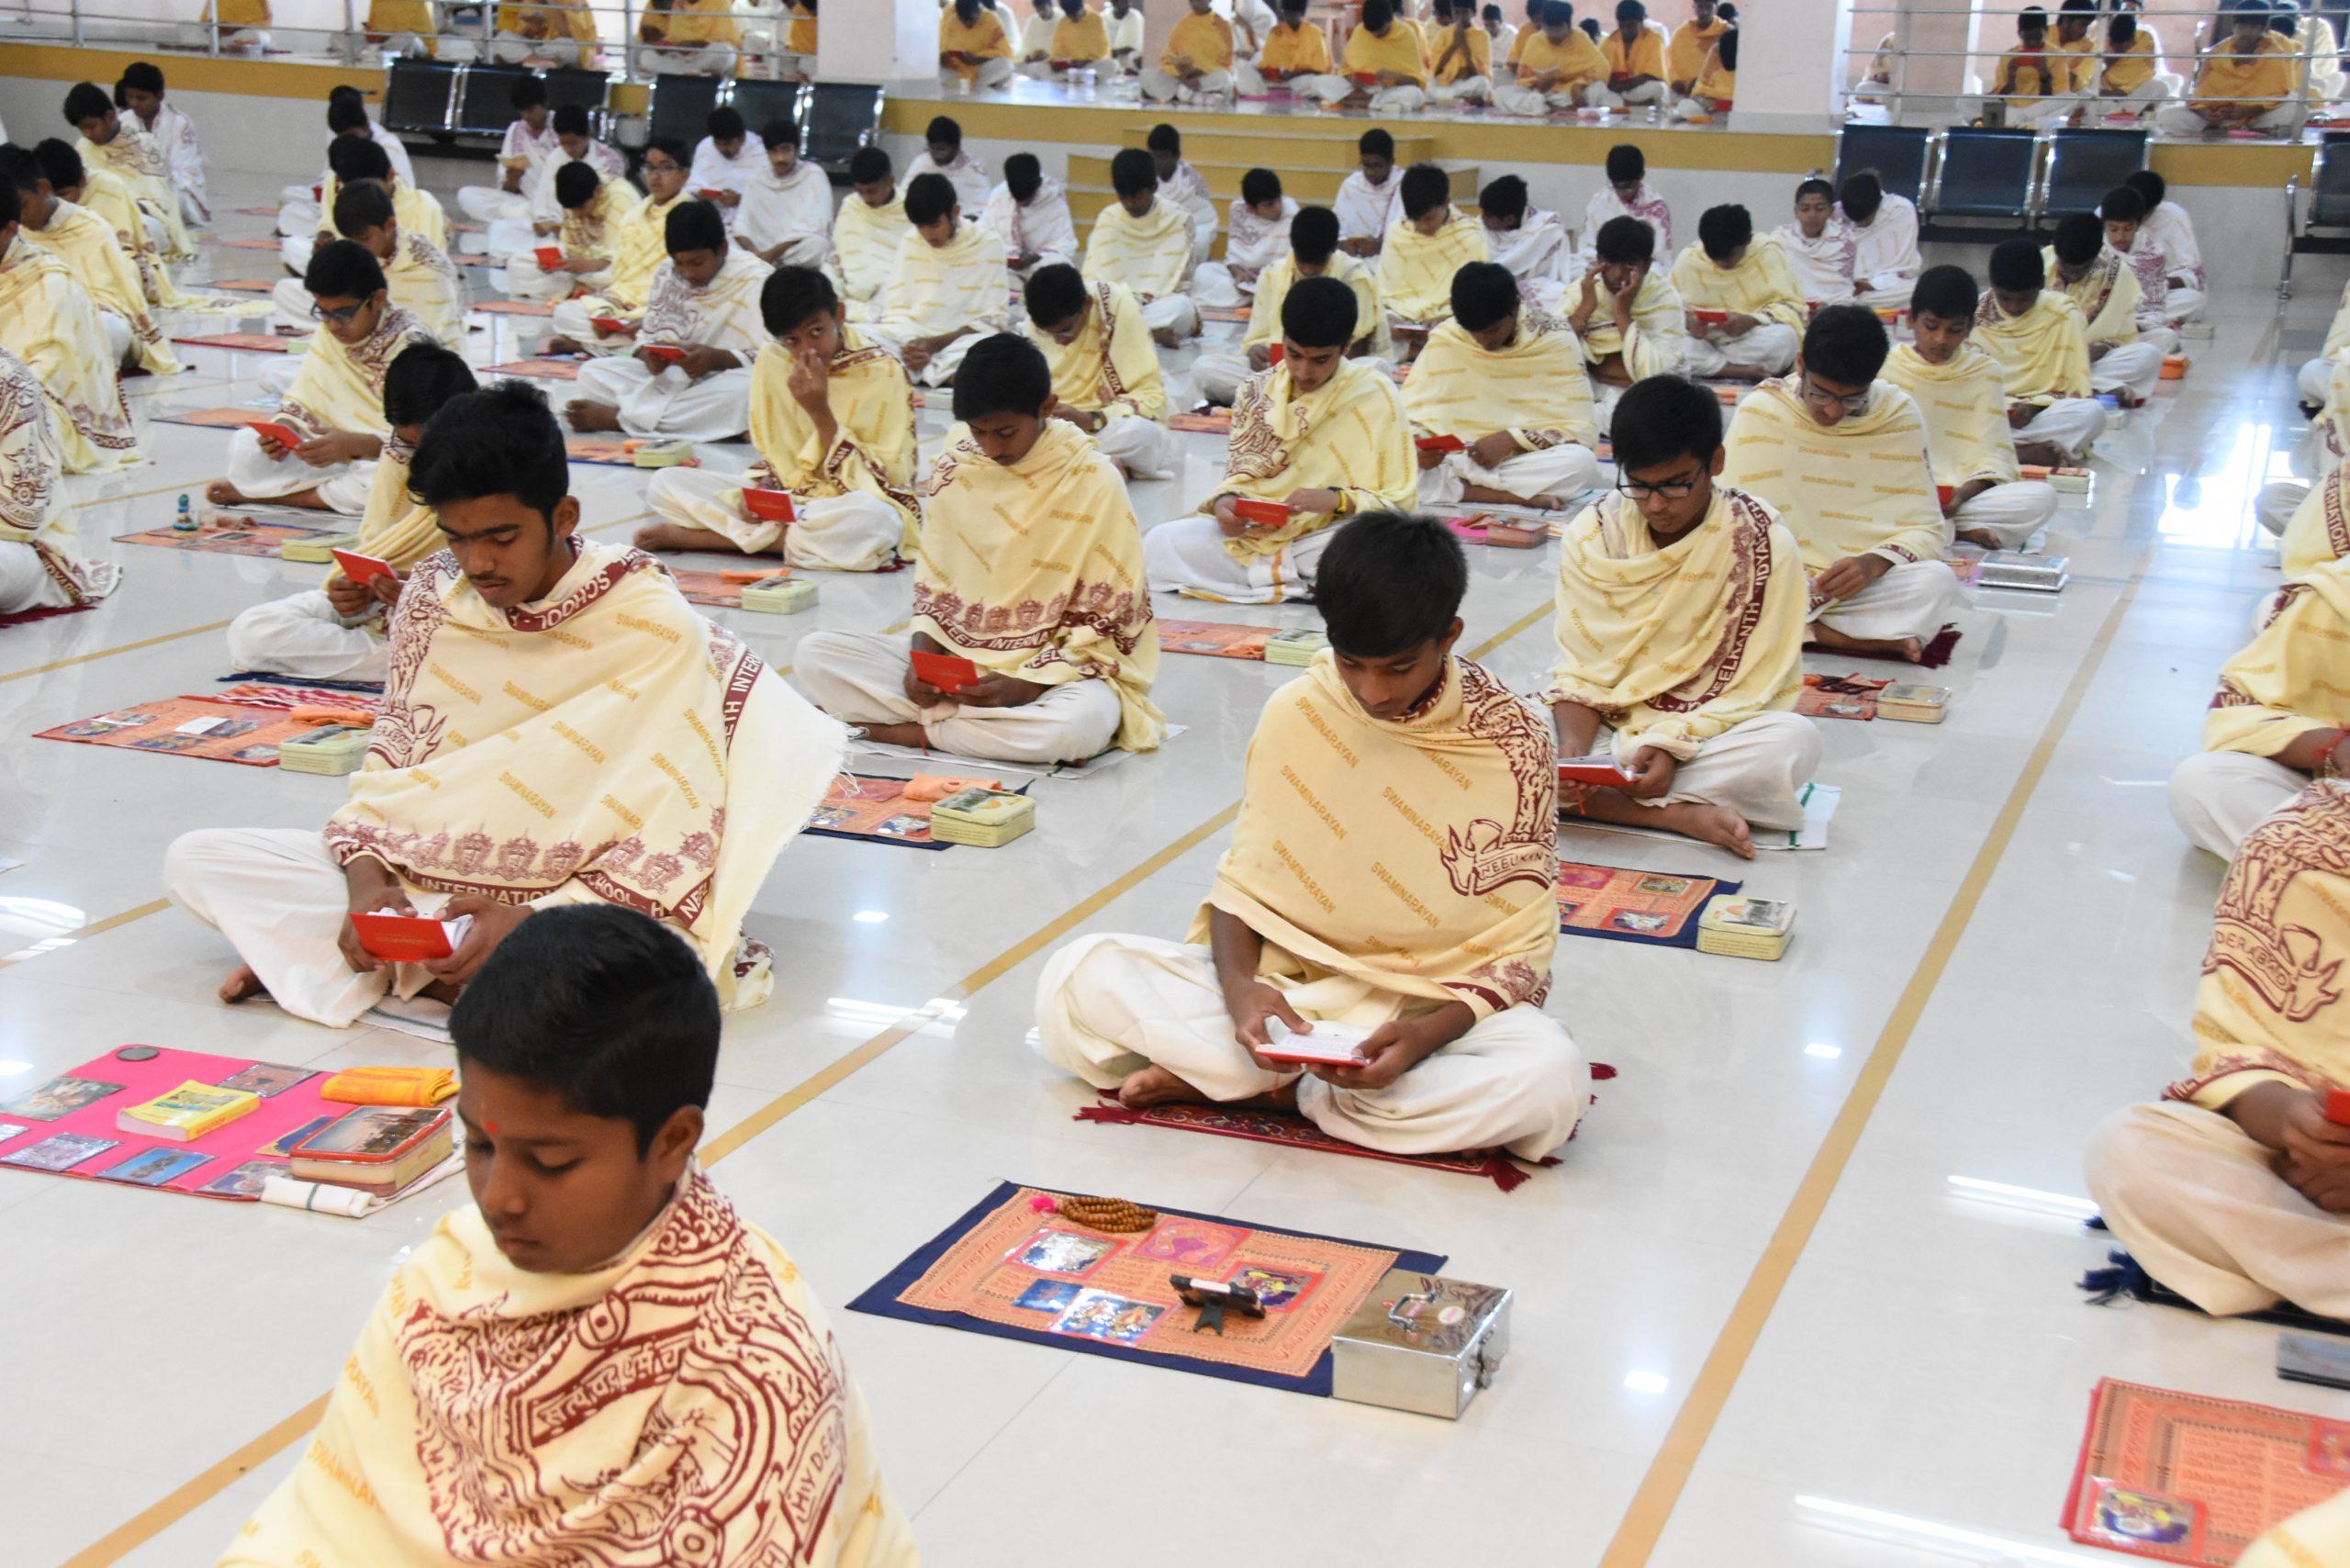 SHREE NEELAKANTH VIDYAPEETH Prayer Hall